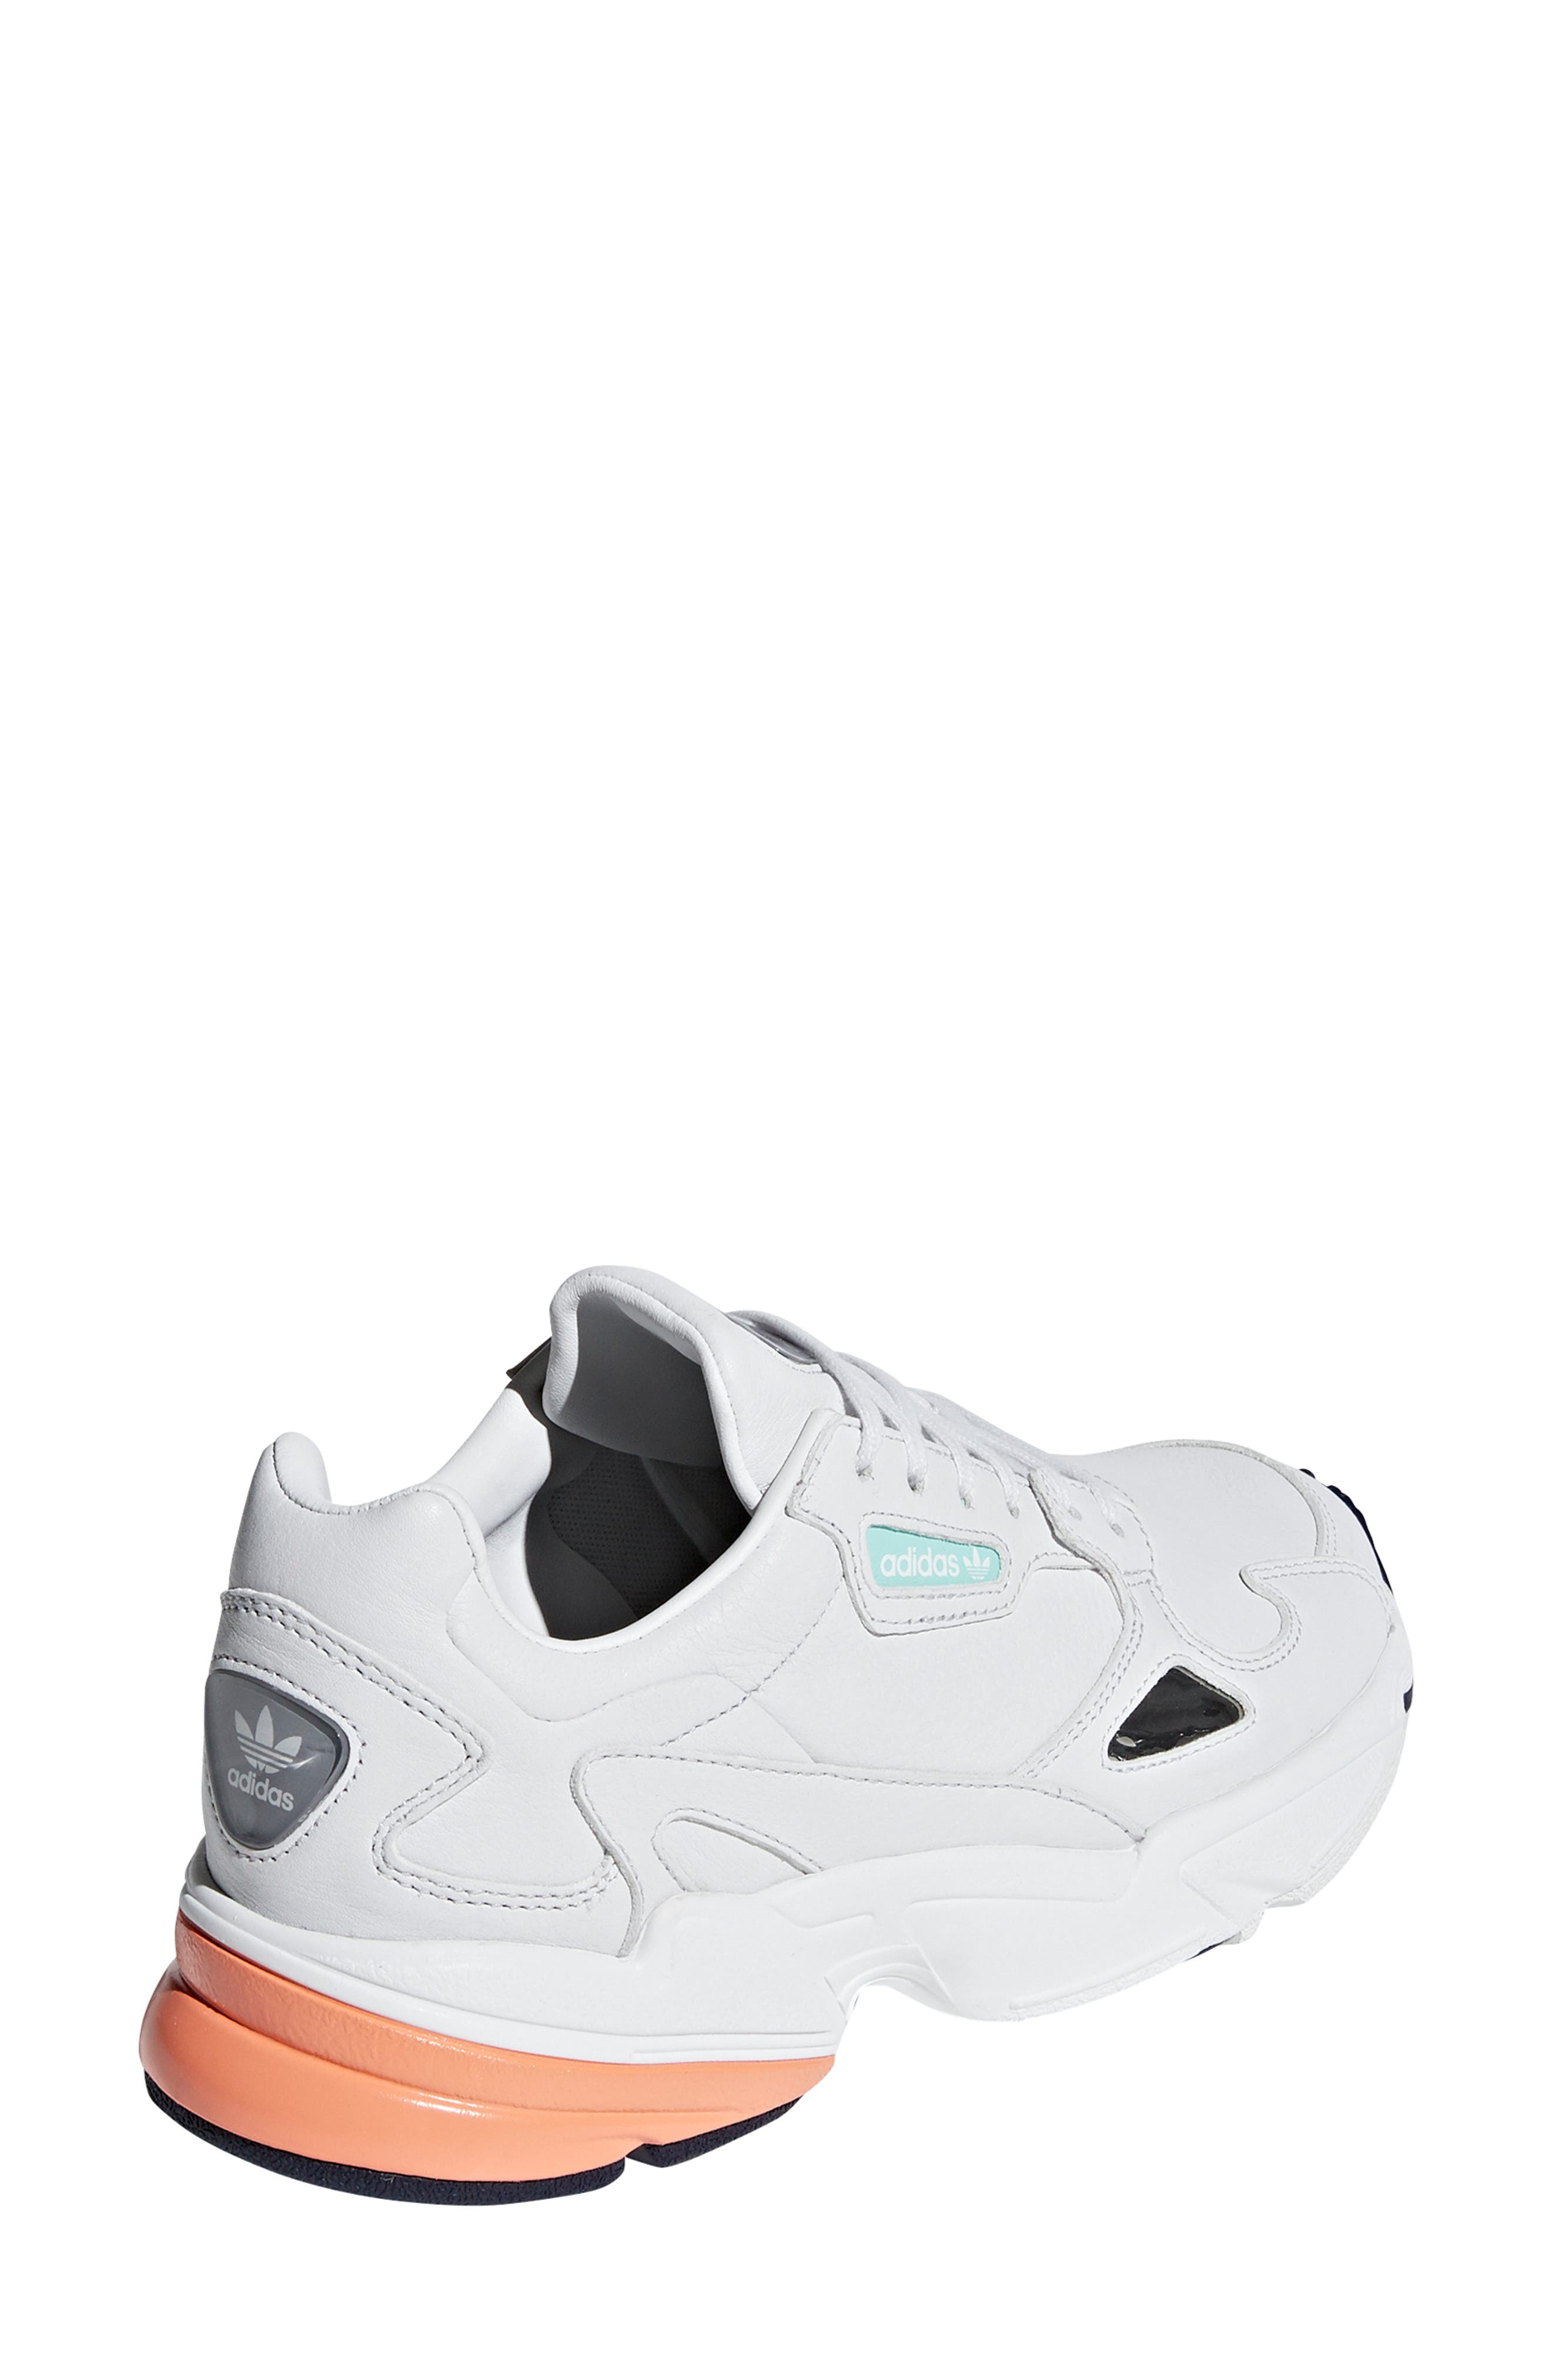 Falcon Sneaker,                             Alternate thumbnail 2, color,                             CRYSTAL WHITE/ EASY ORANGE